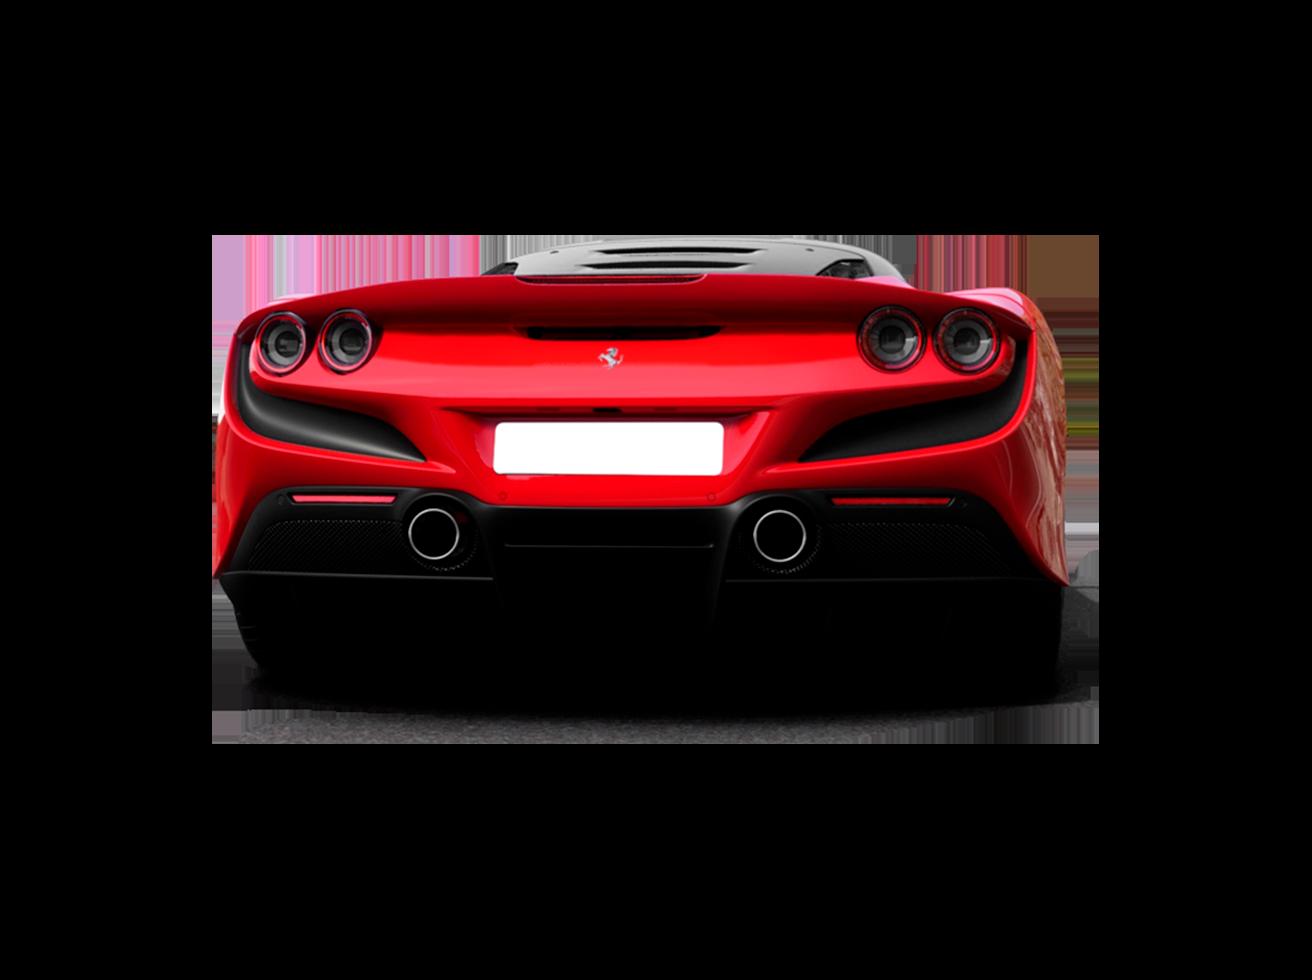 3.9 V8 TURBO TRIBUTO GASOLINA F1-DCT